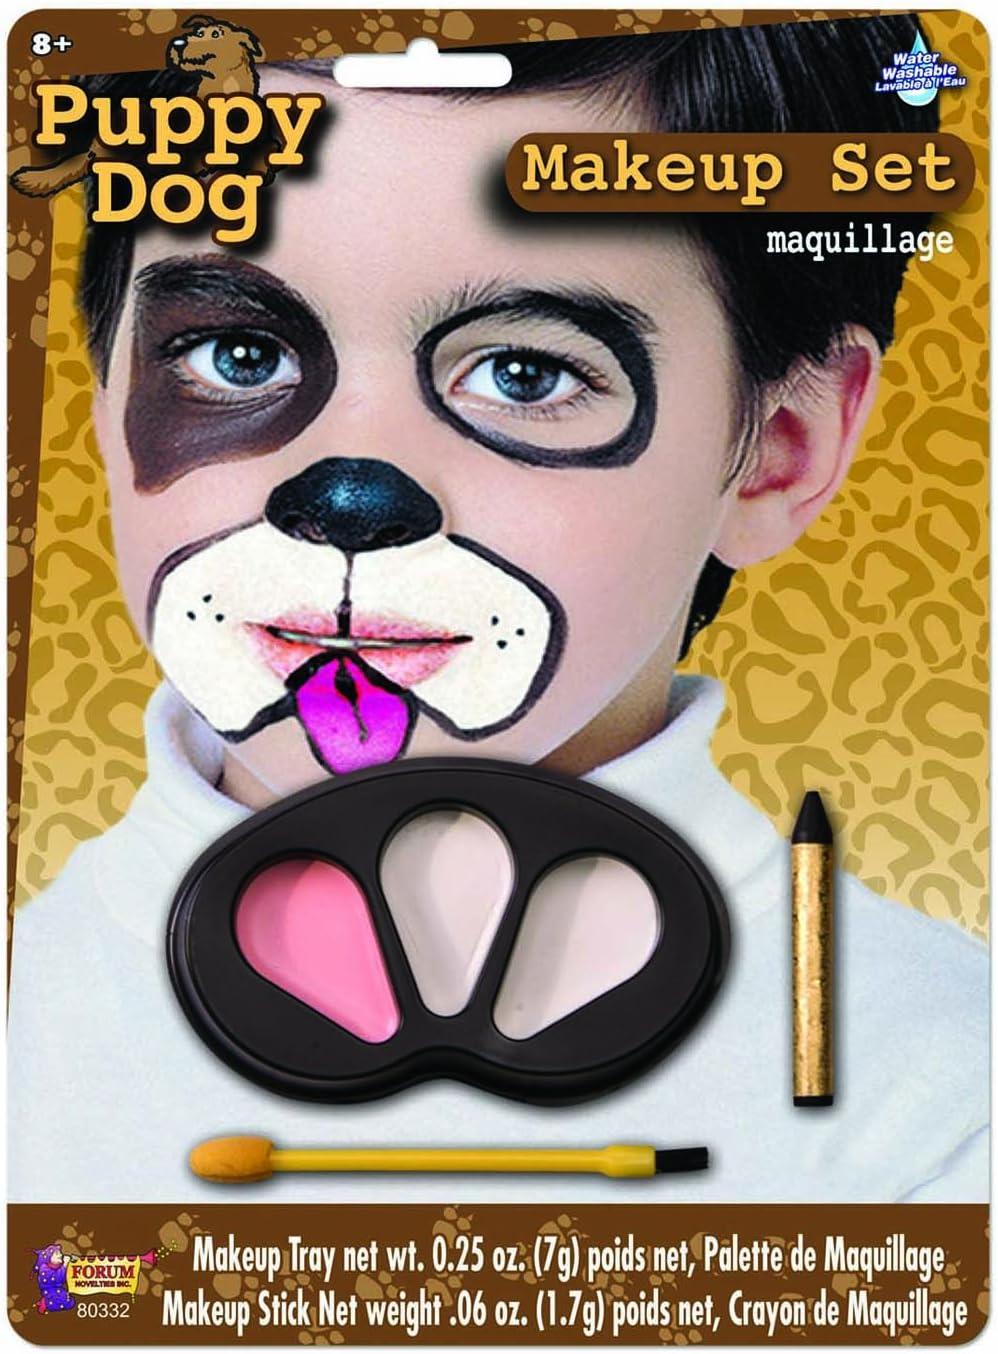 Dog Halloween Makeup.Amazon Com Forum Novelties Puppy Dog Makeup Kit For Children Halloween Animal Face Paint For Kids Toys Games